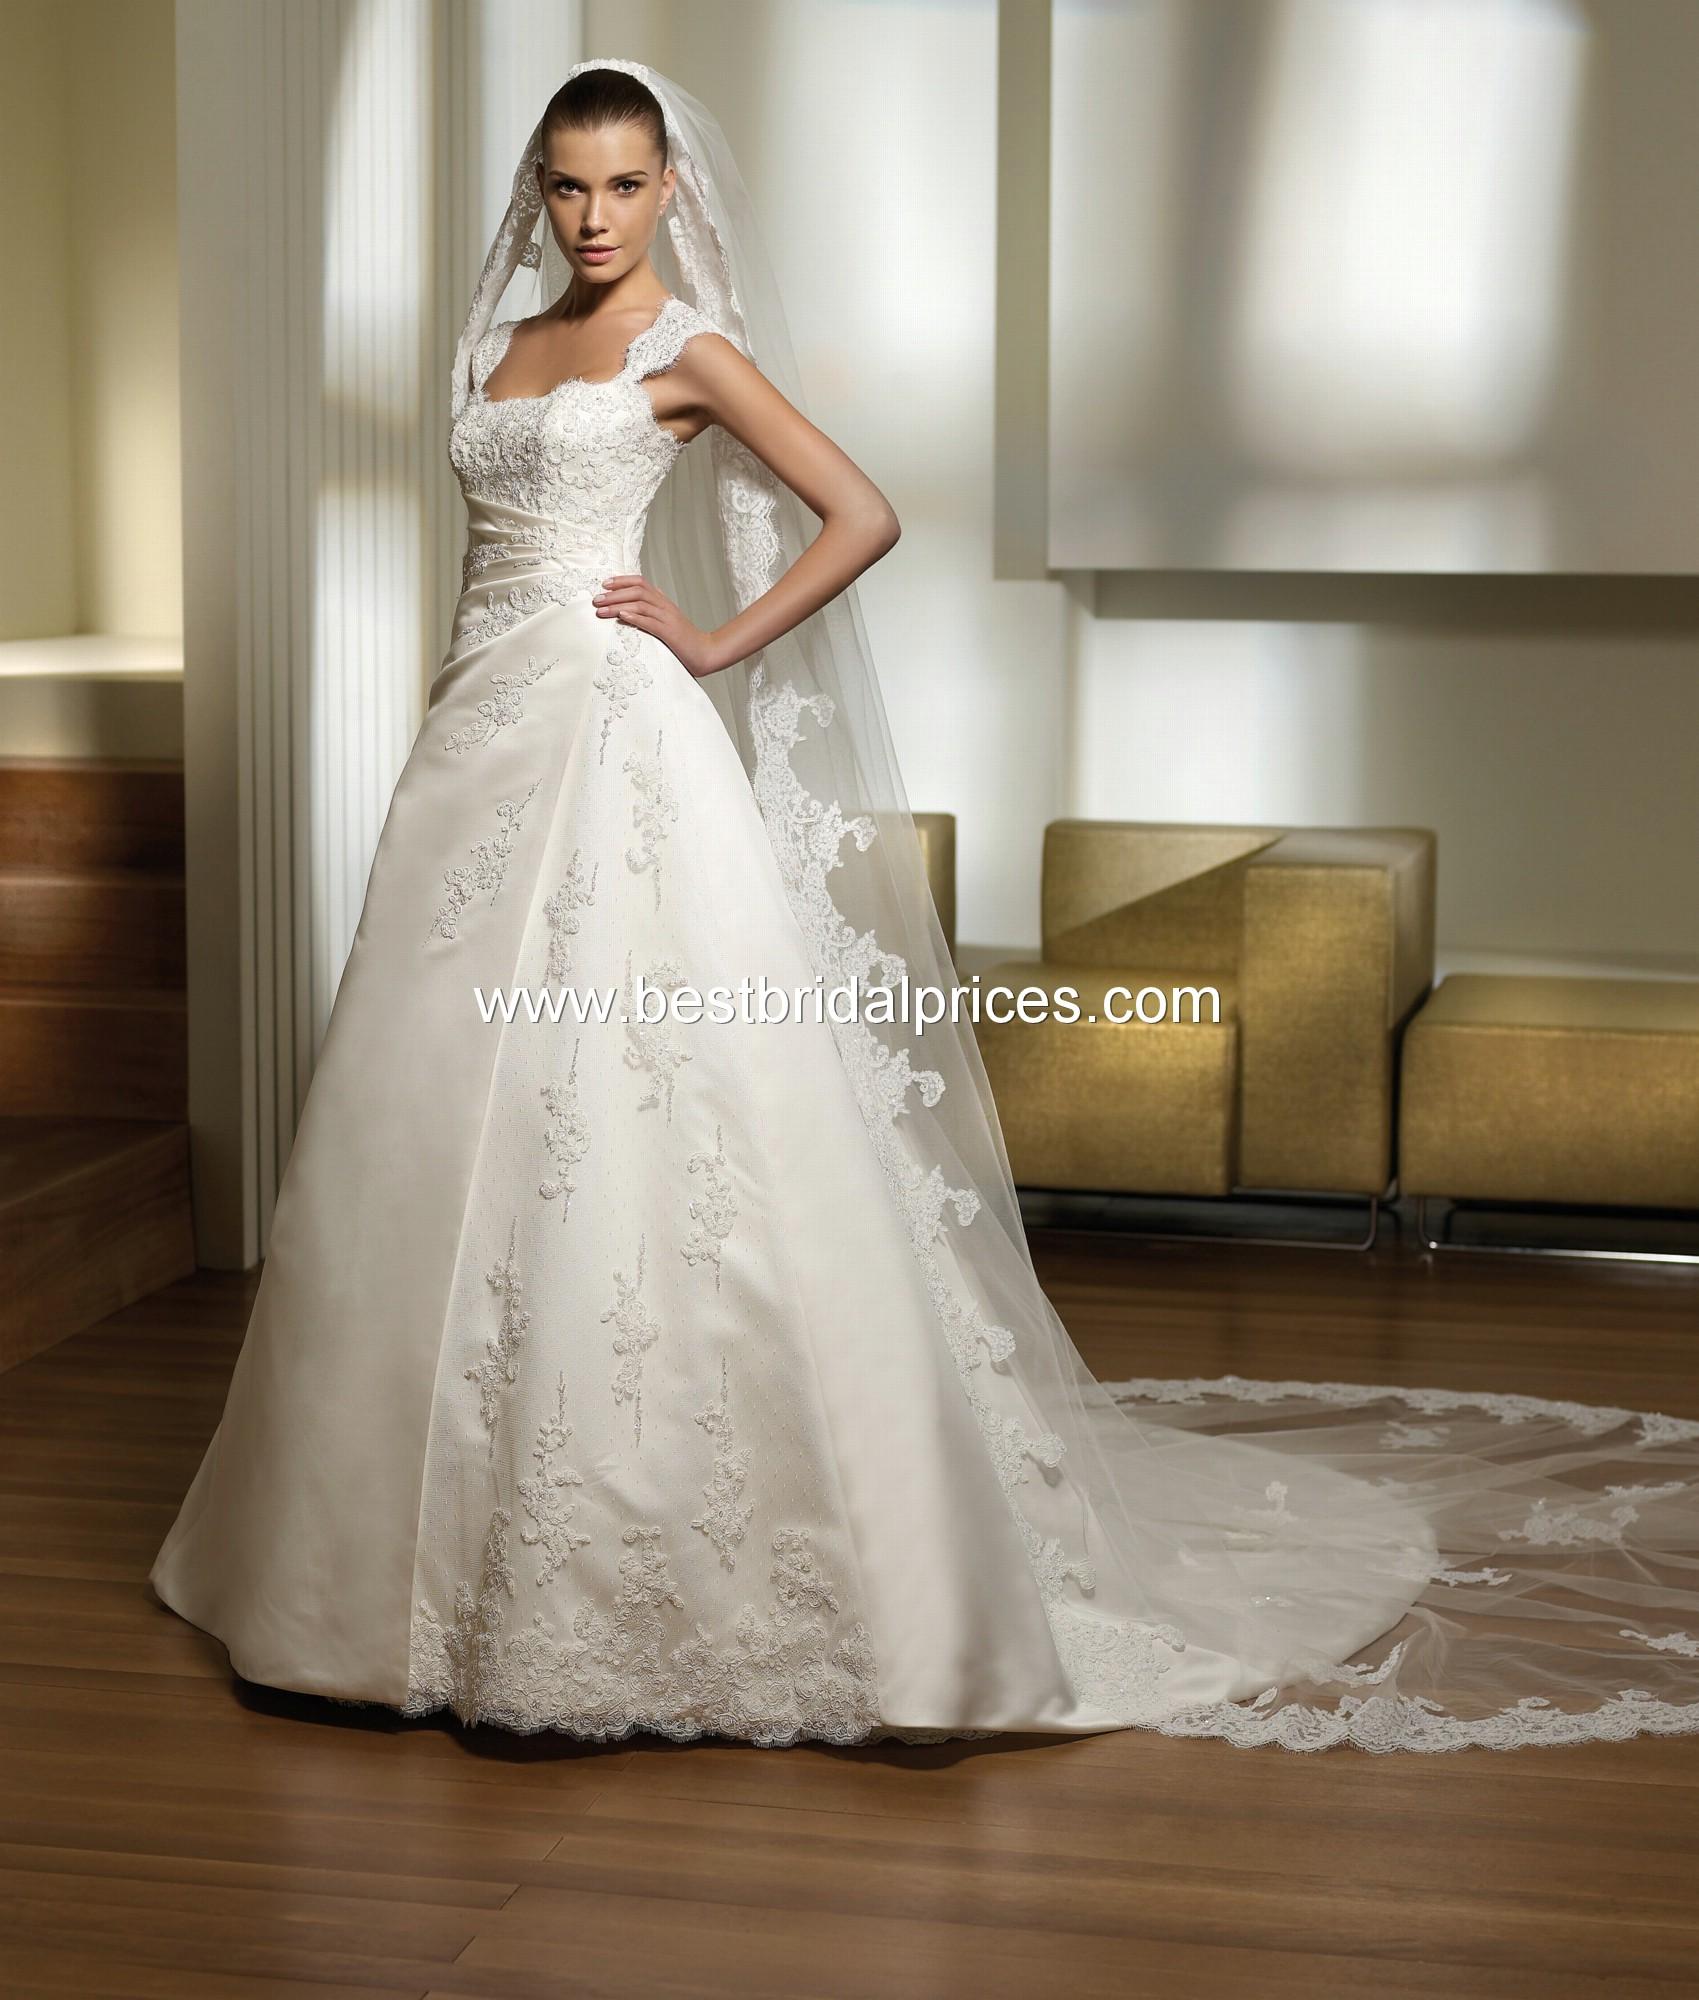 st patrick wedding dresses photo - 1